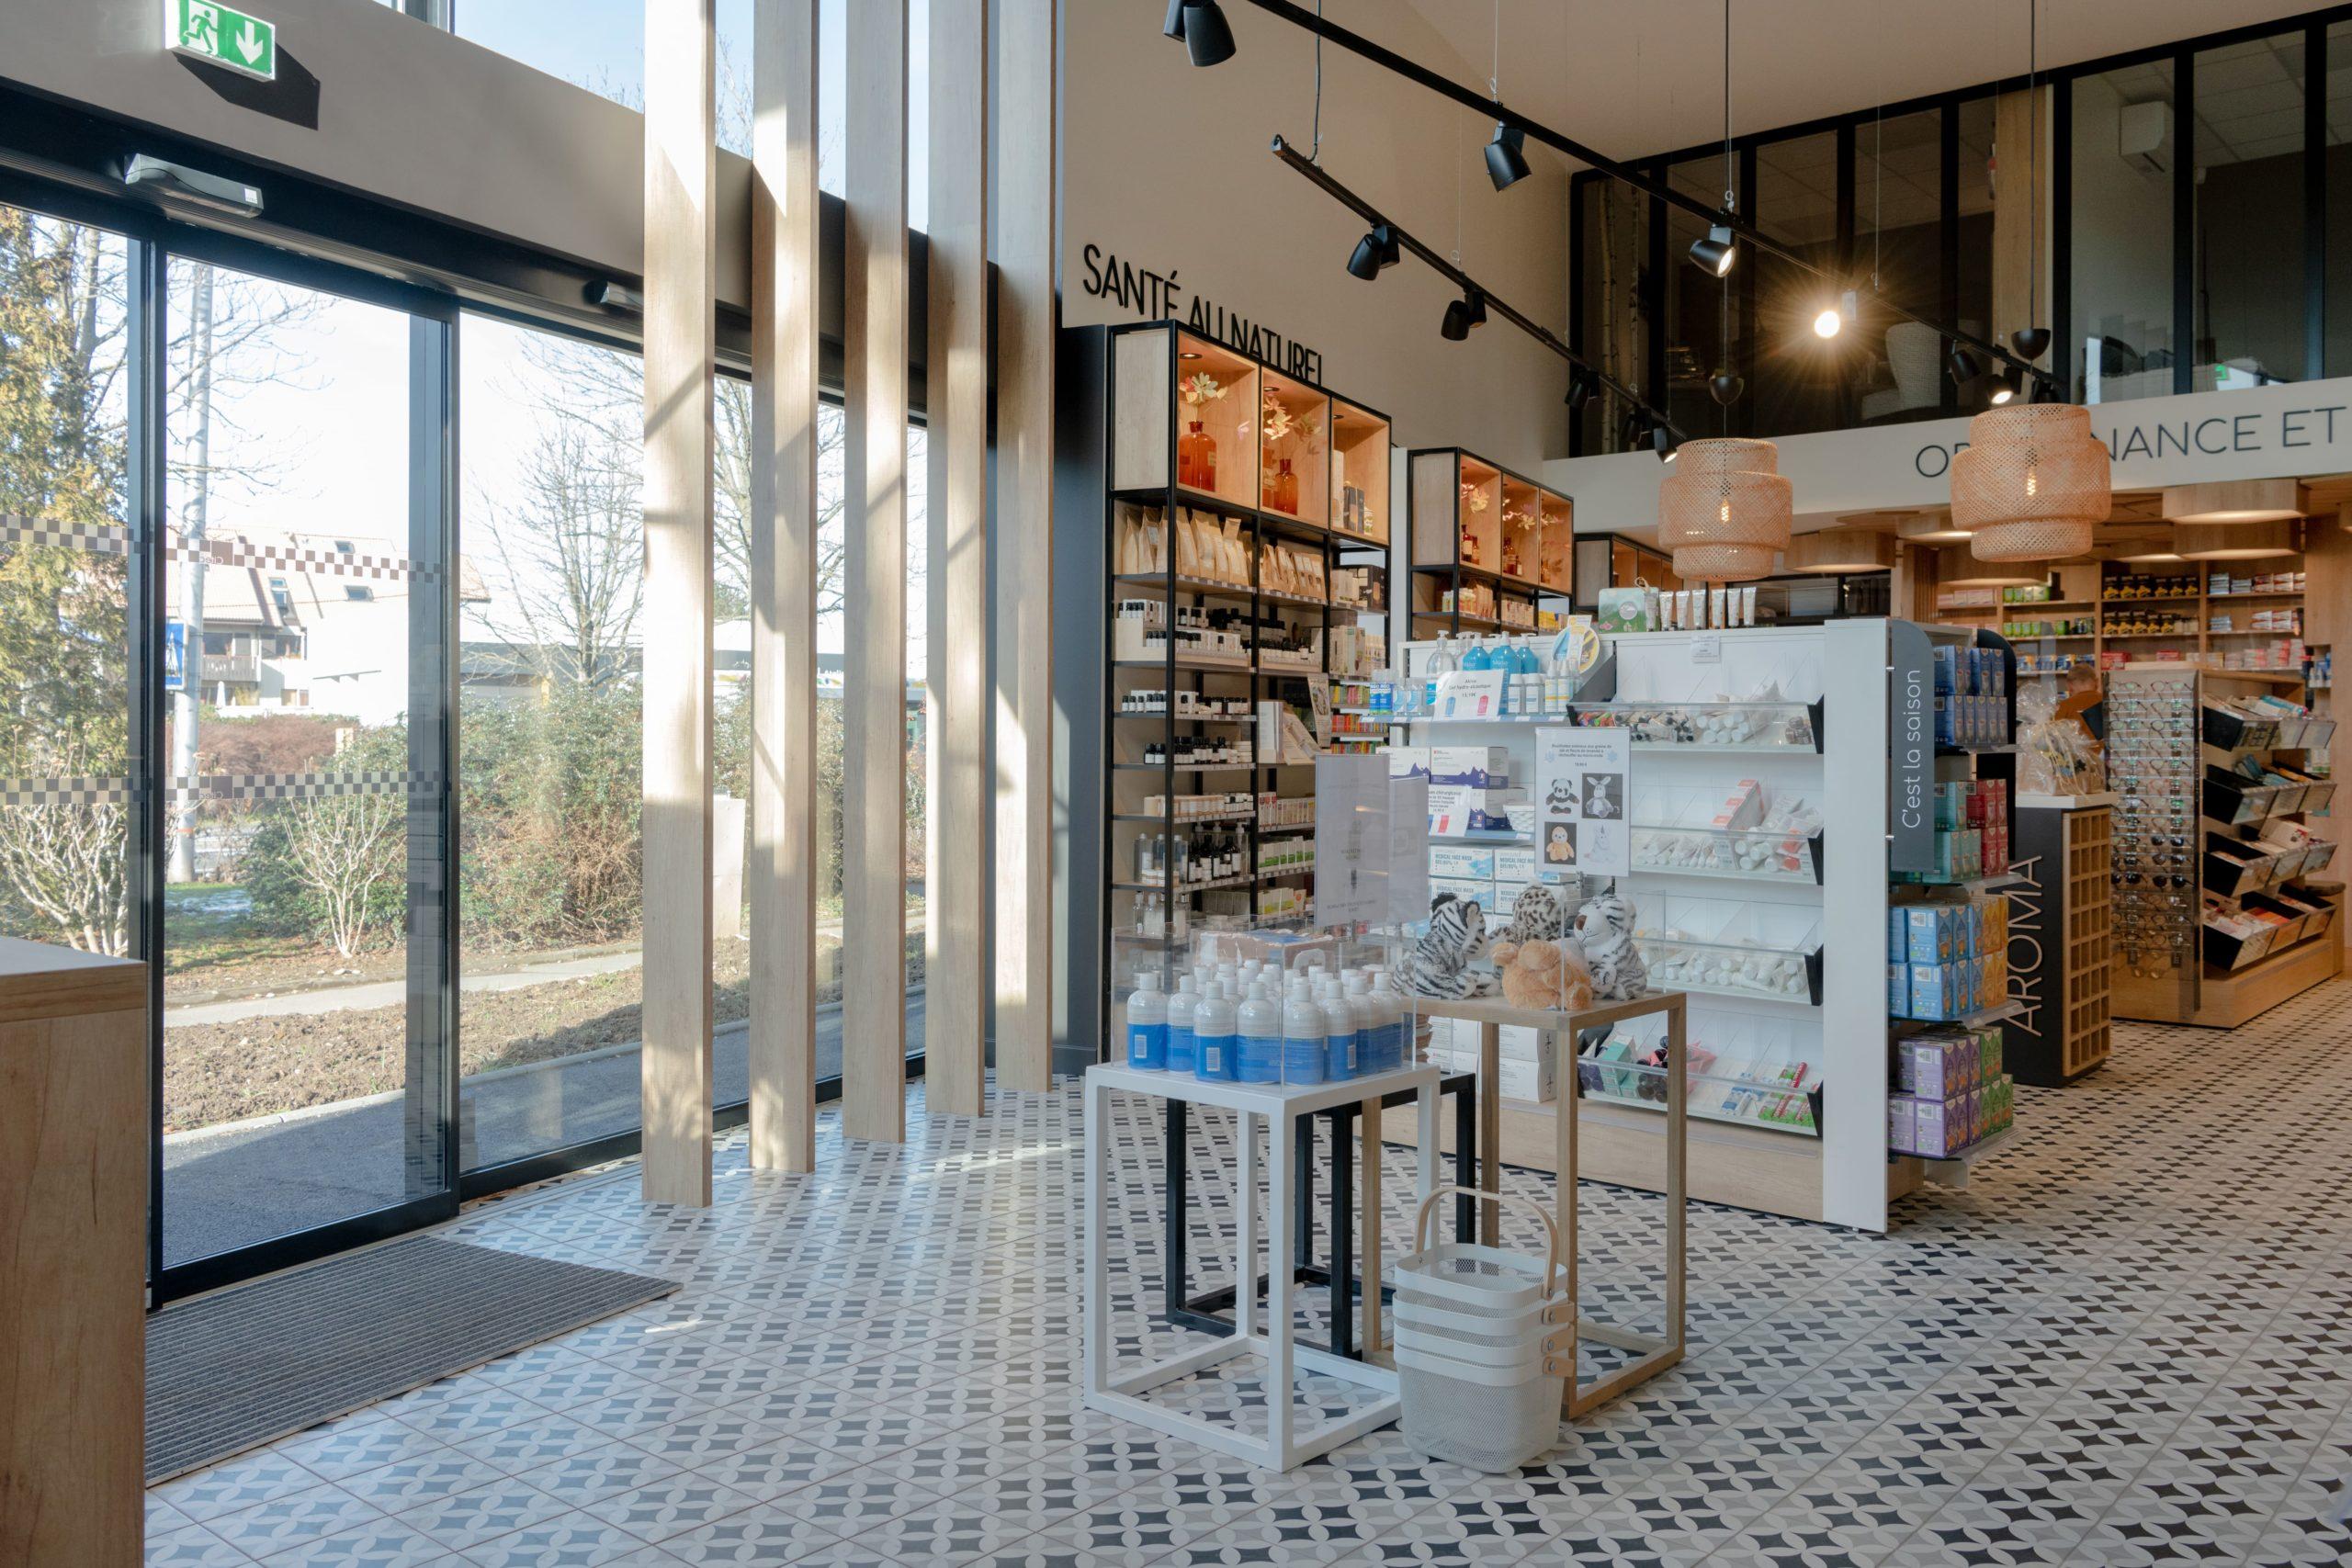 Thonon-Les-Bains-LeGallo-Cubik-Agenceur-9194